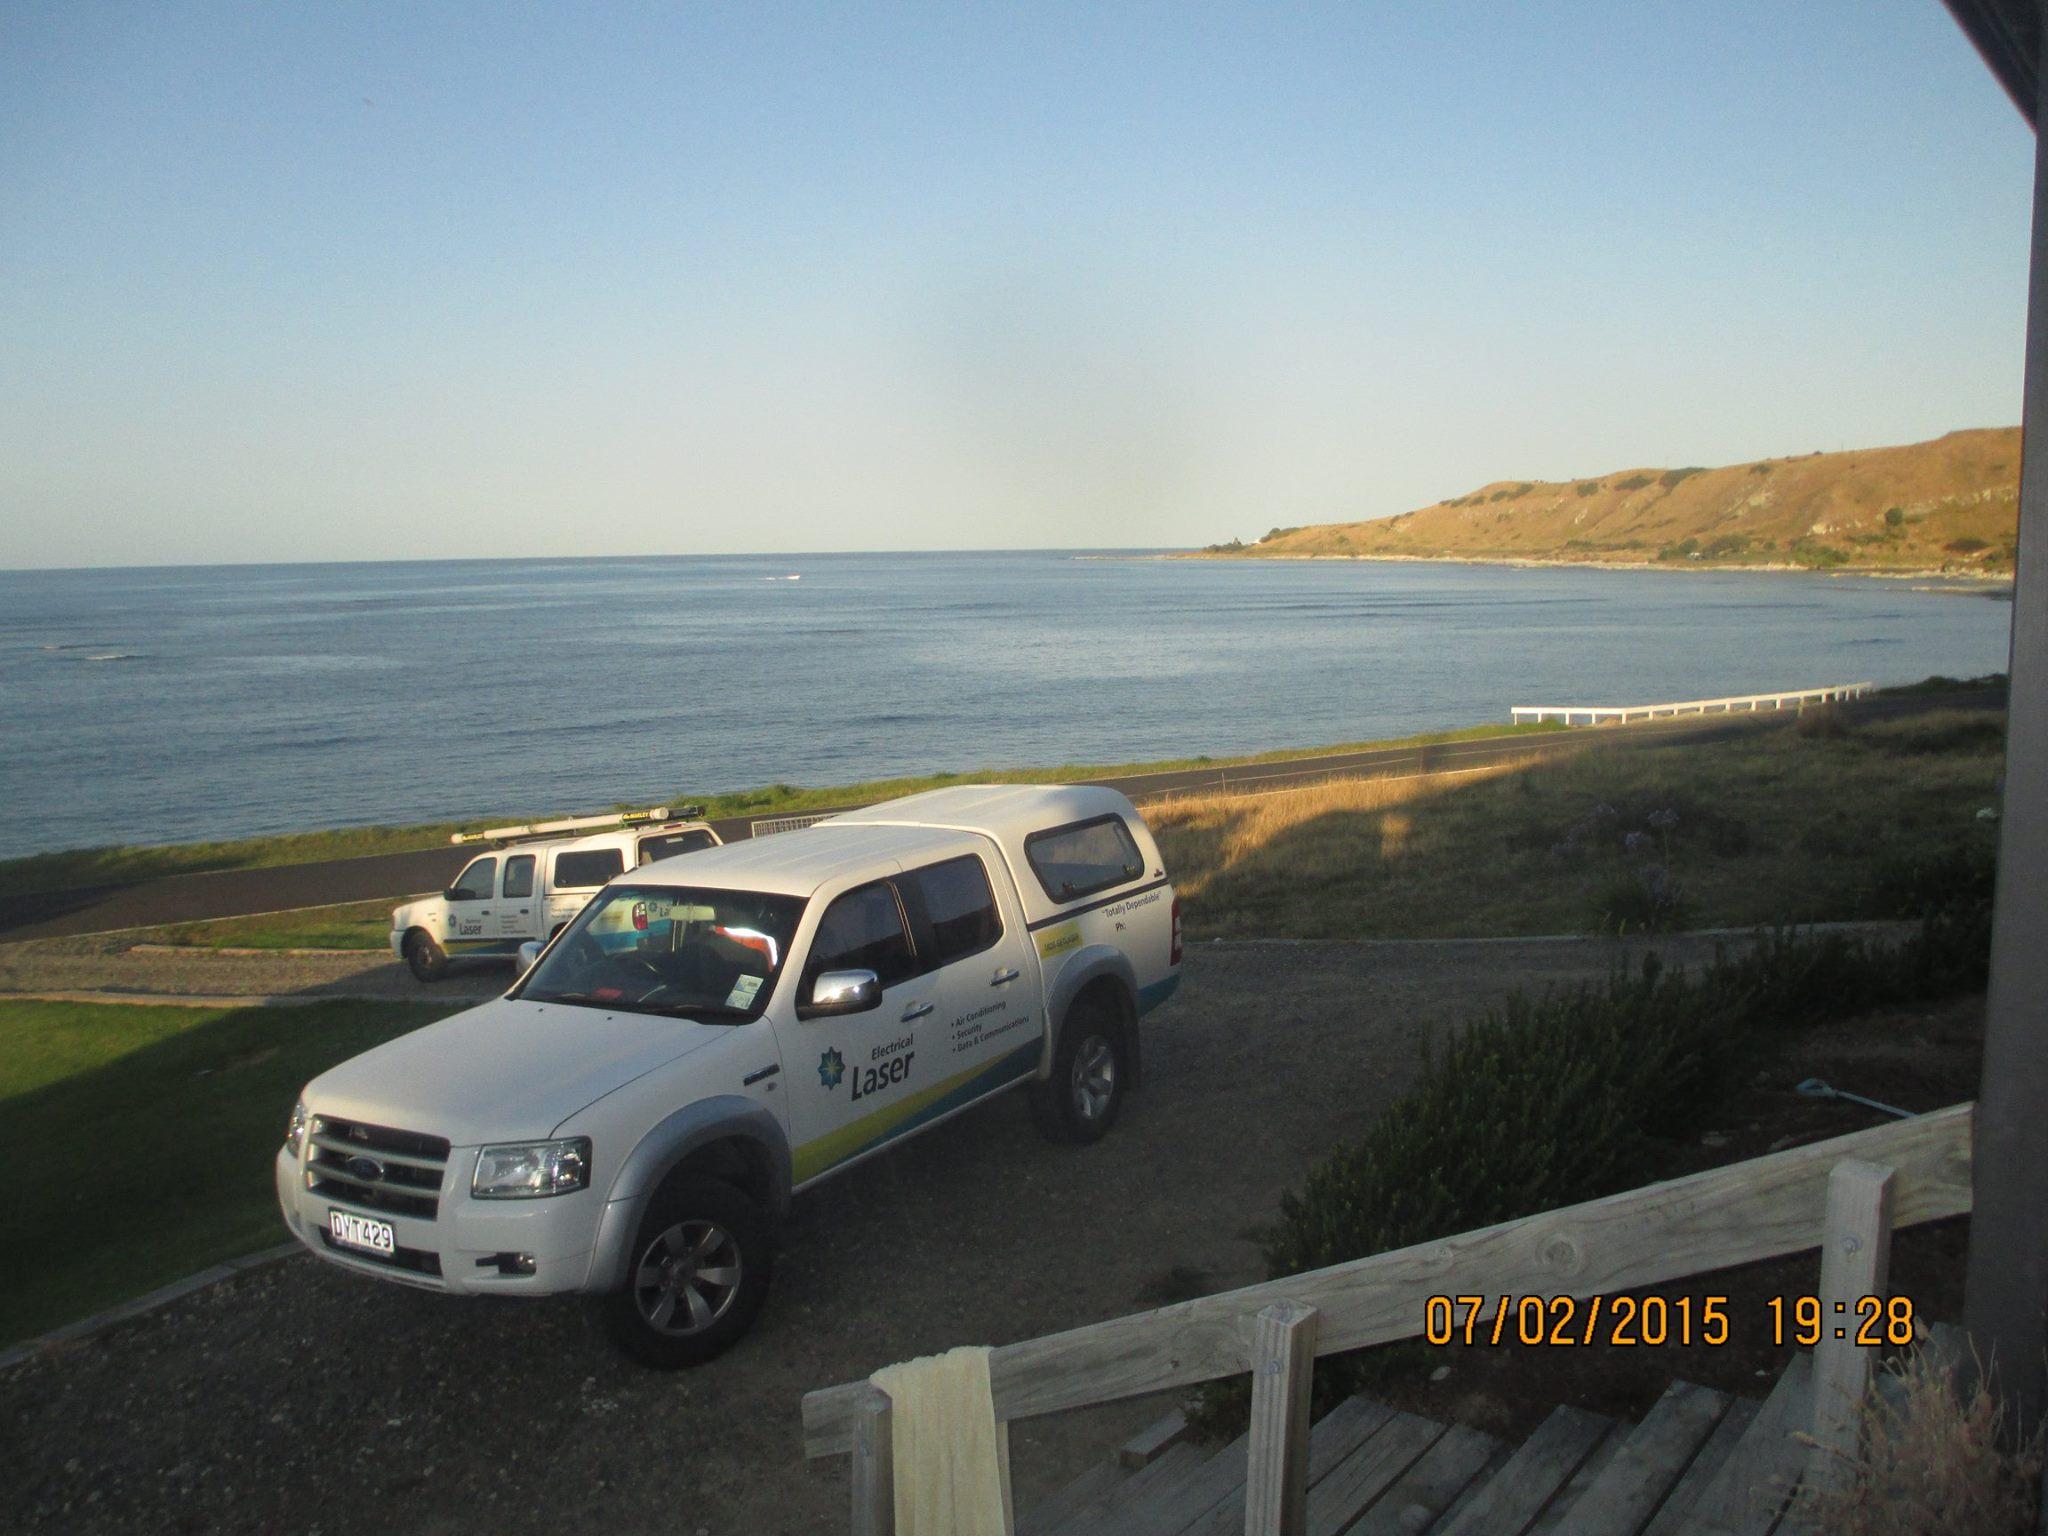 Seaside Views on the Job